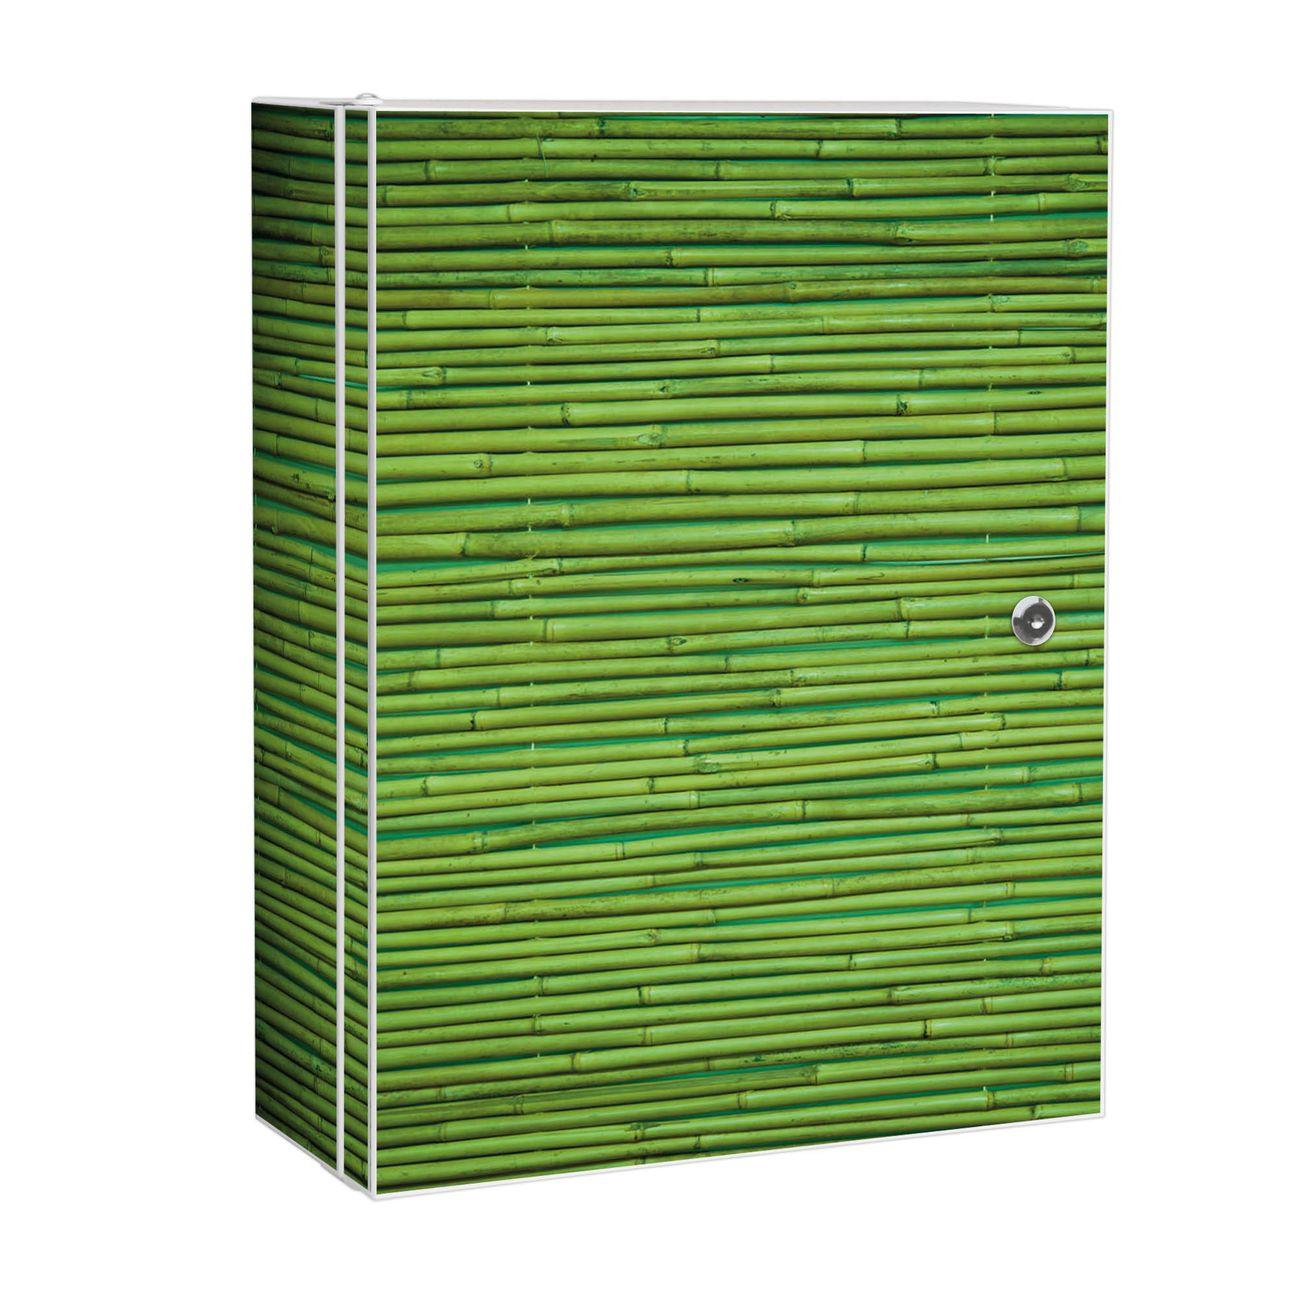 Medizinschrank Stahl Motiv Bambus Grün